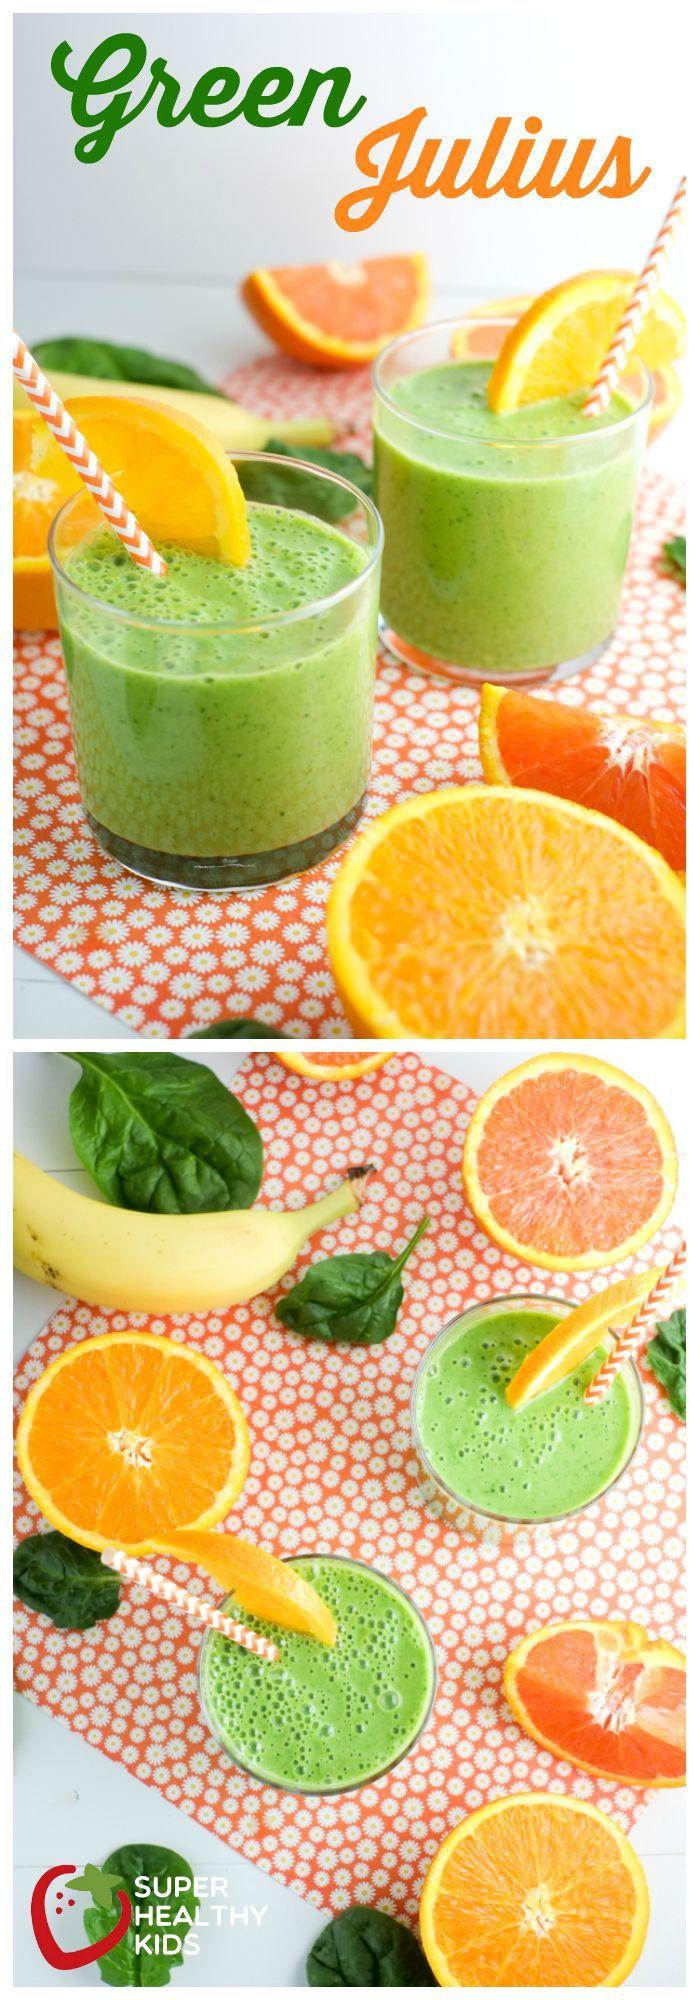 Green Julius: Healthy Orange Julius Recipe | Super Healthy Kids | Food and Drink